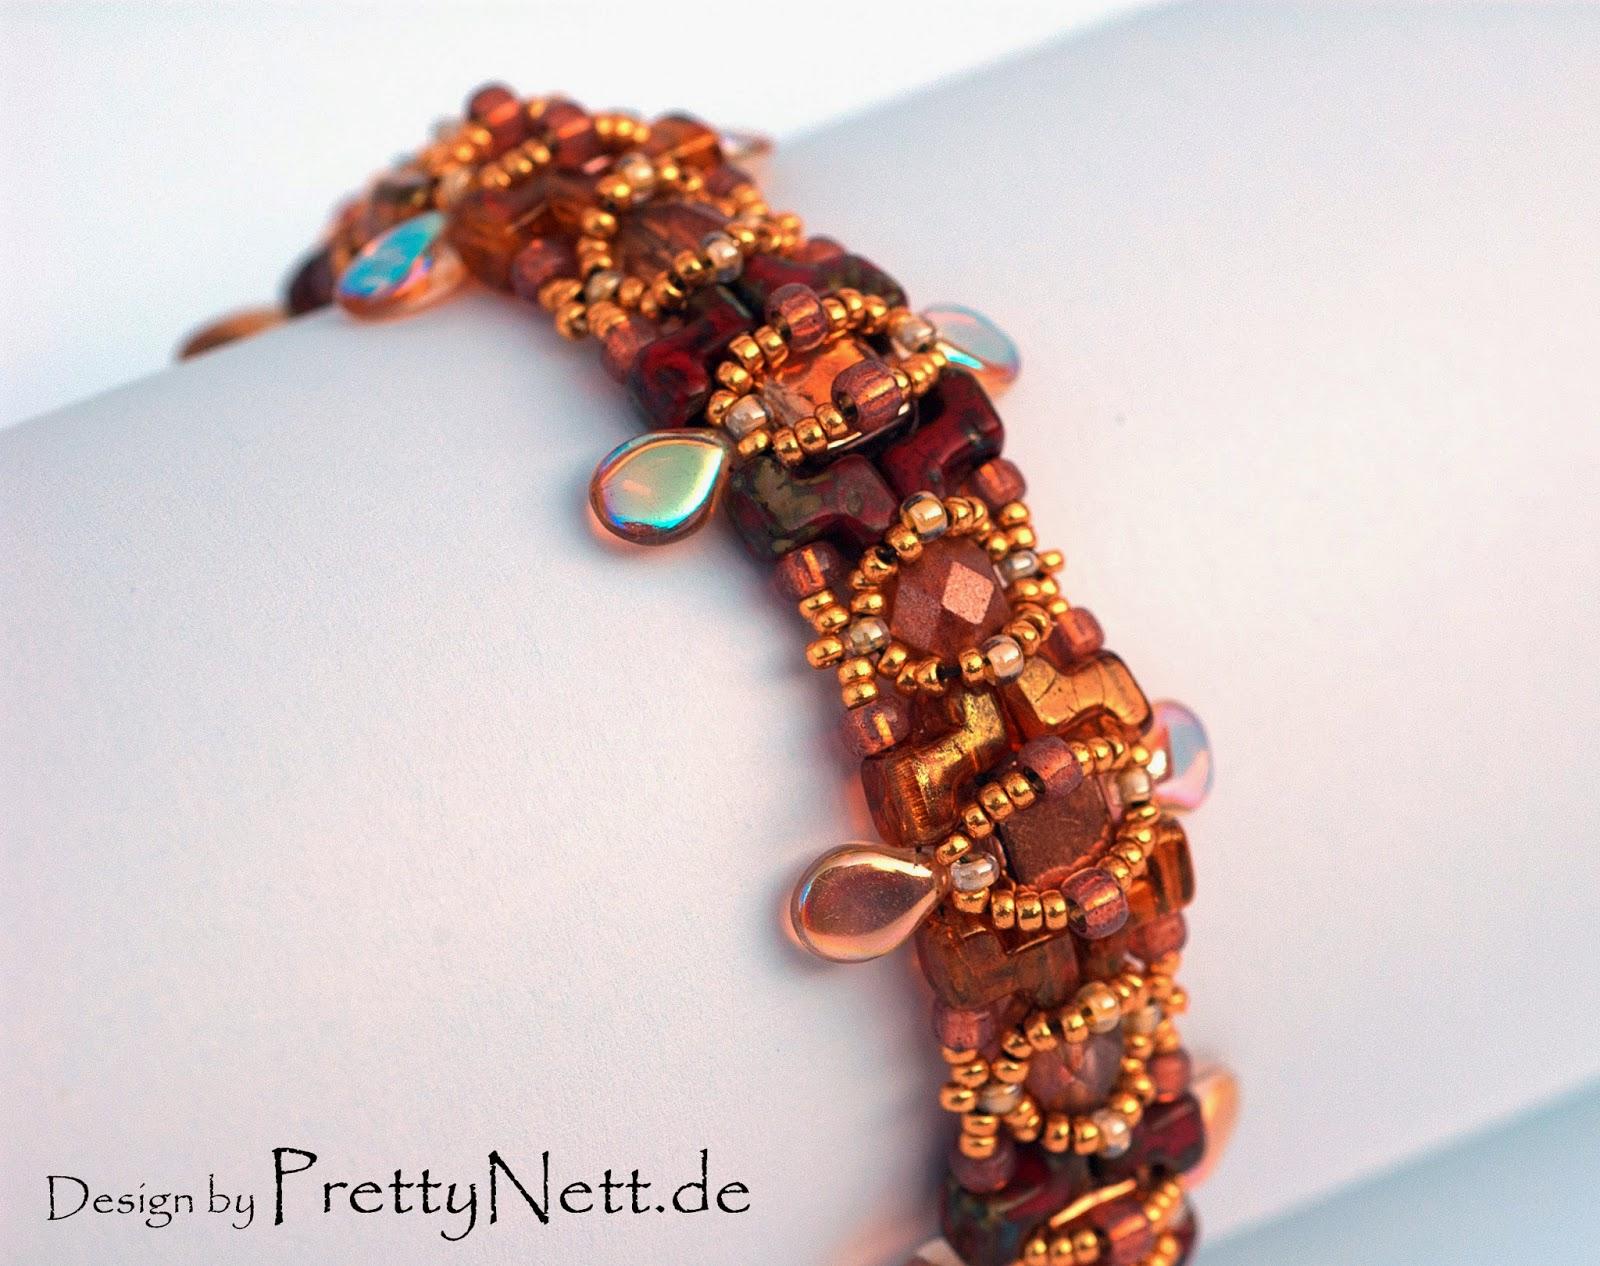 "Bracelet ""Reiko"" design by PrettyNett.de"